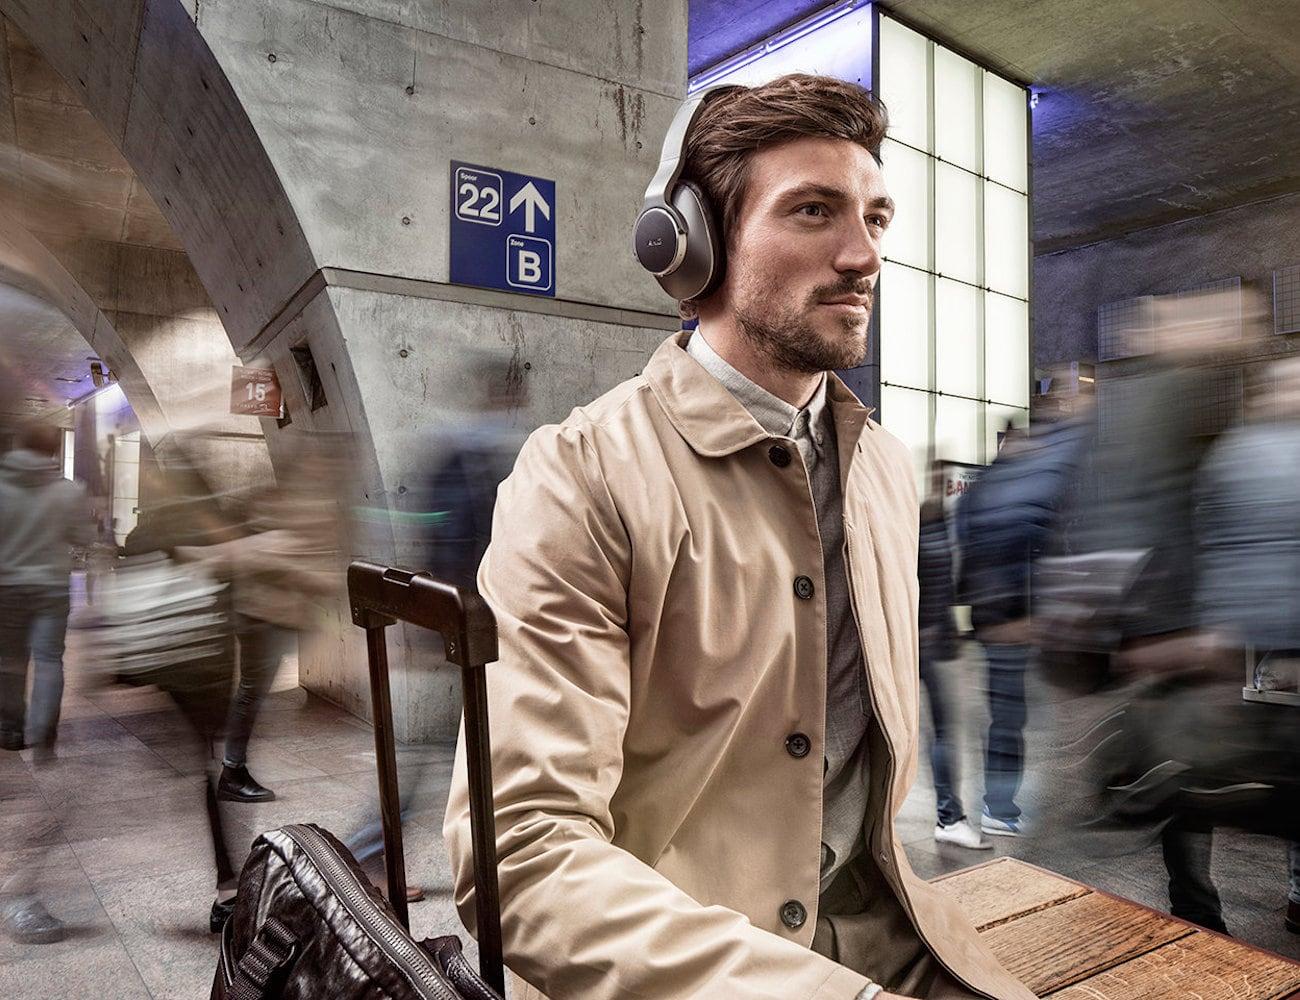 Samsung Wireless AKG Headphones